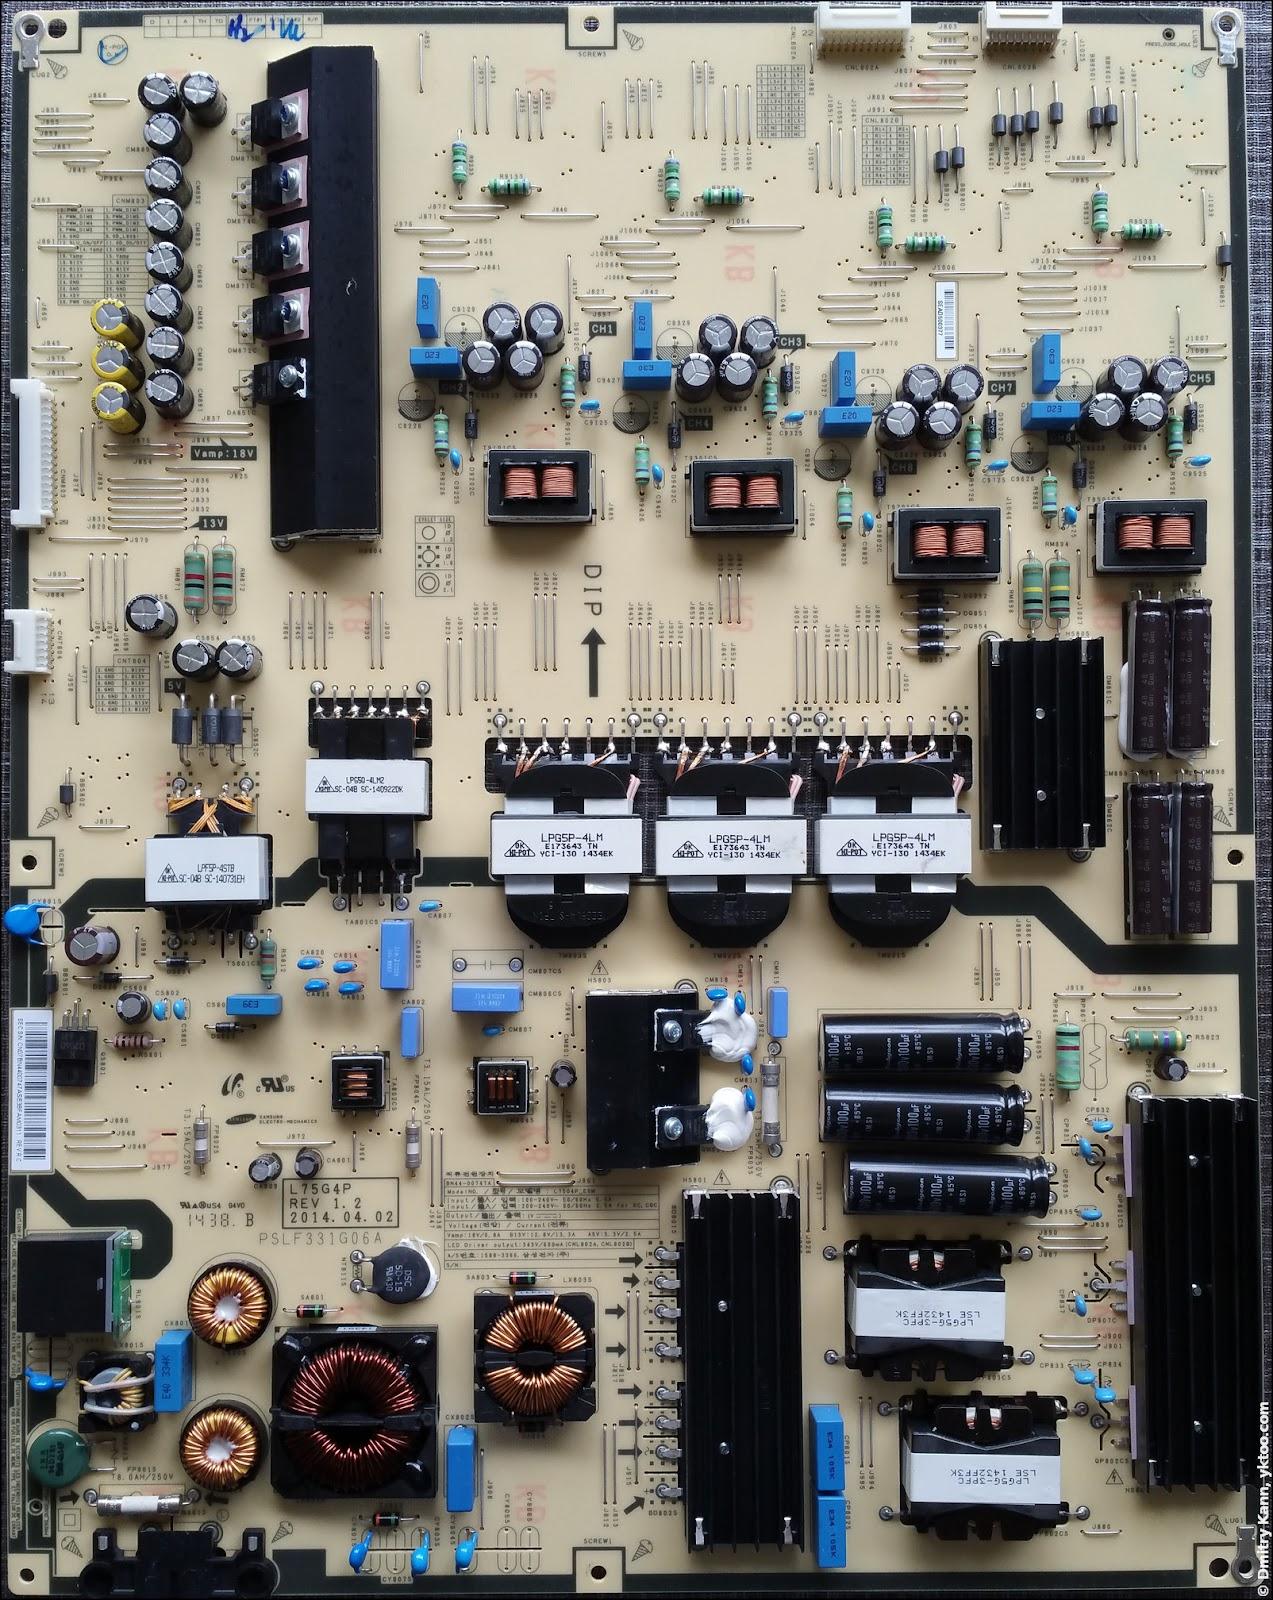 Power supply board.